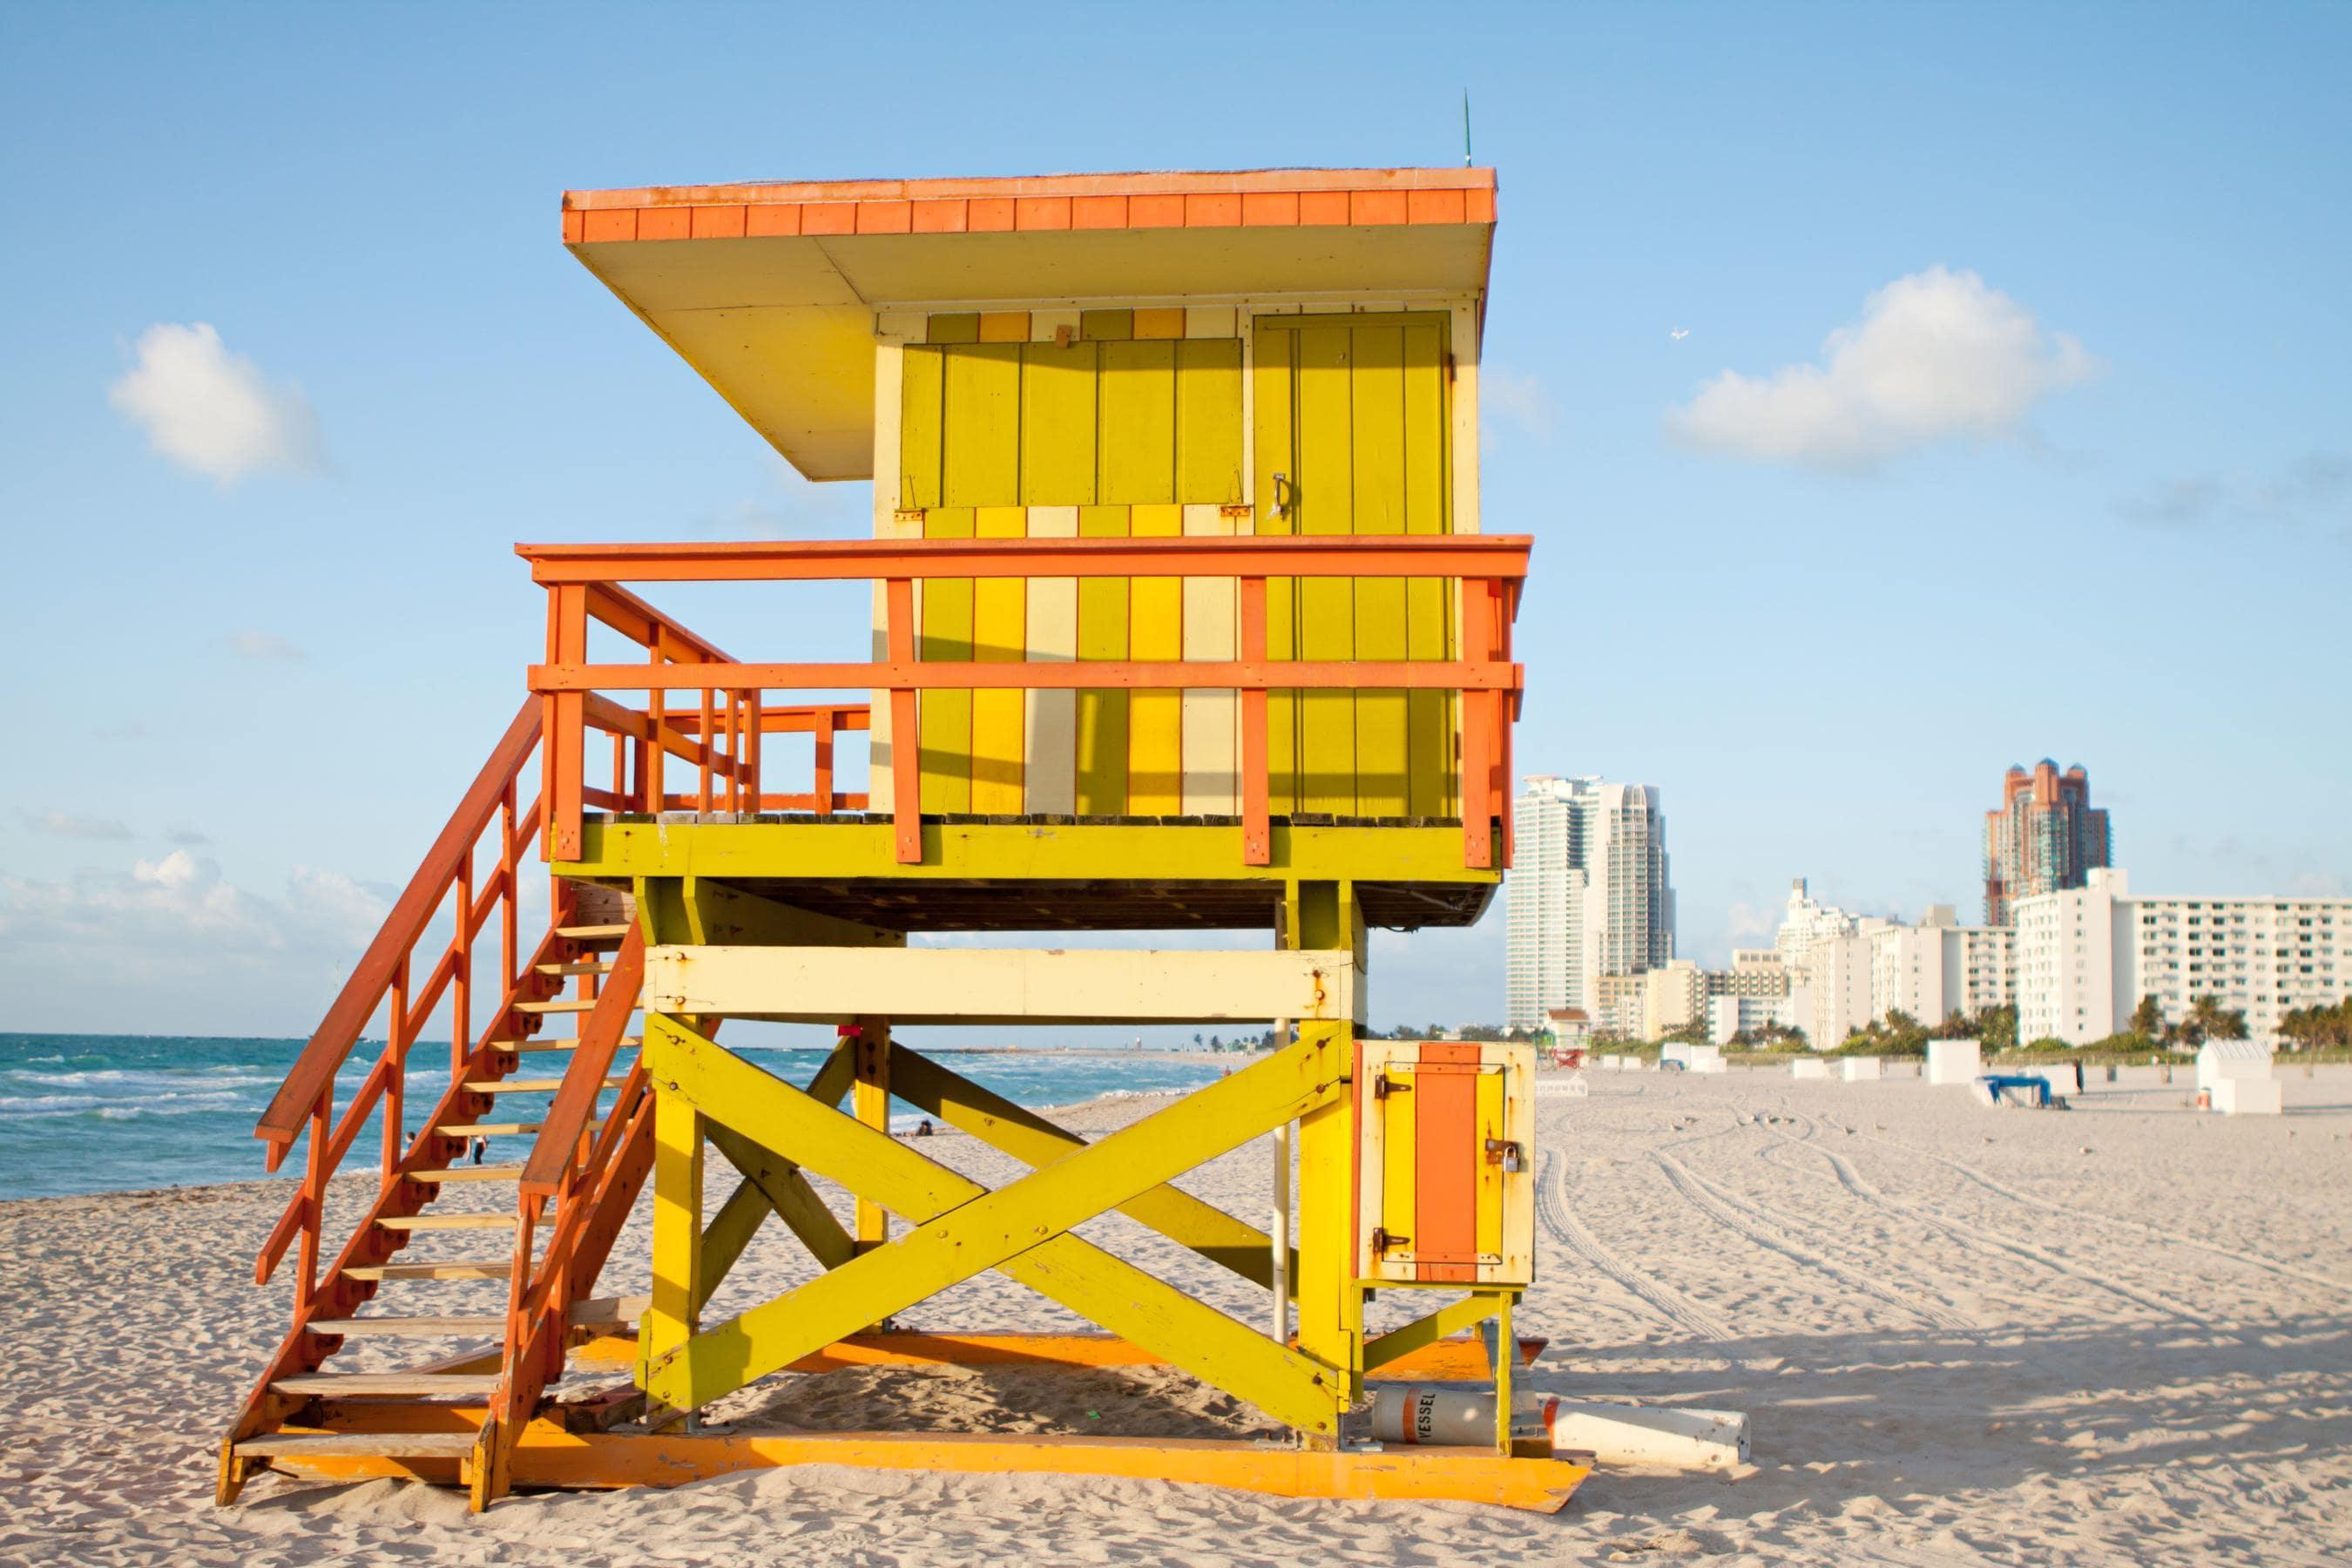 02_Miami-Best-Beaches-8th-Street_Shutterstock_136656746